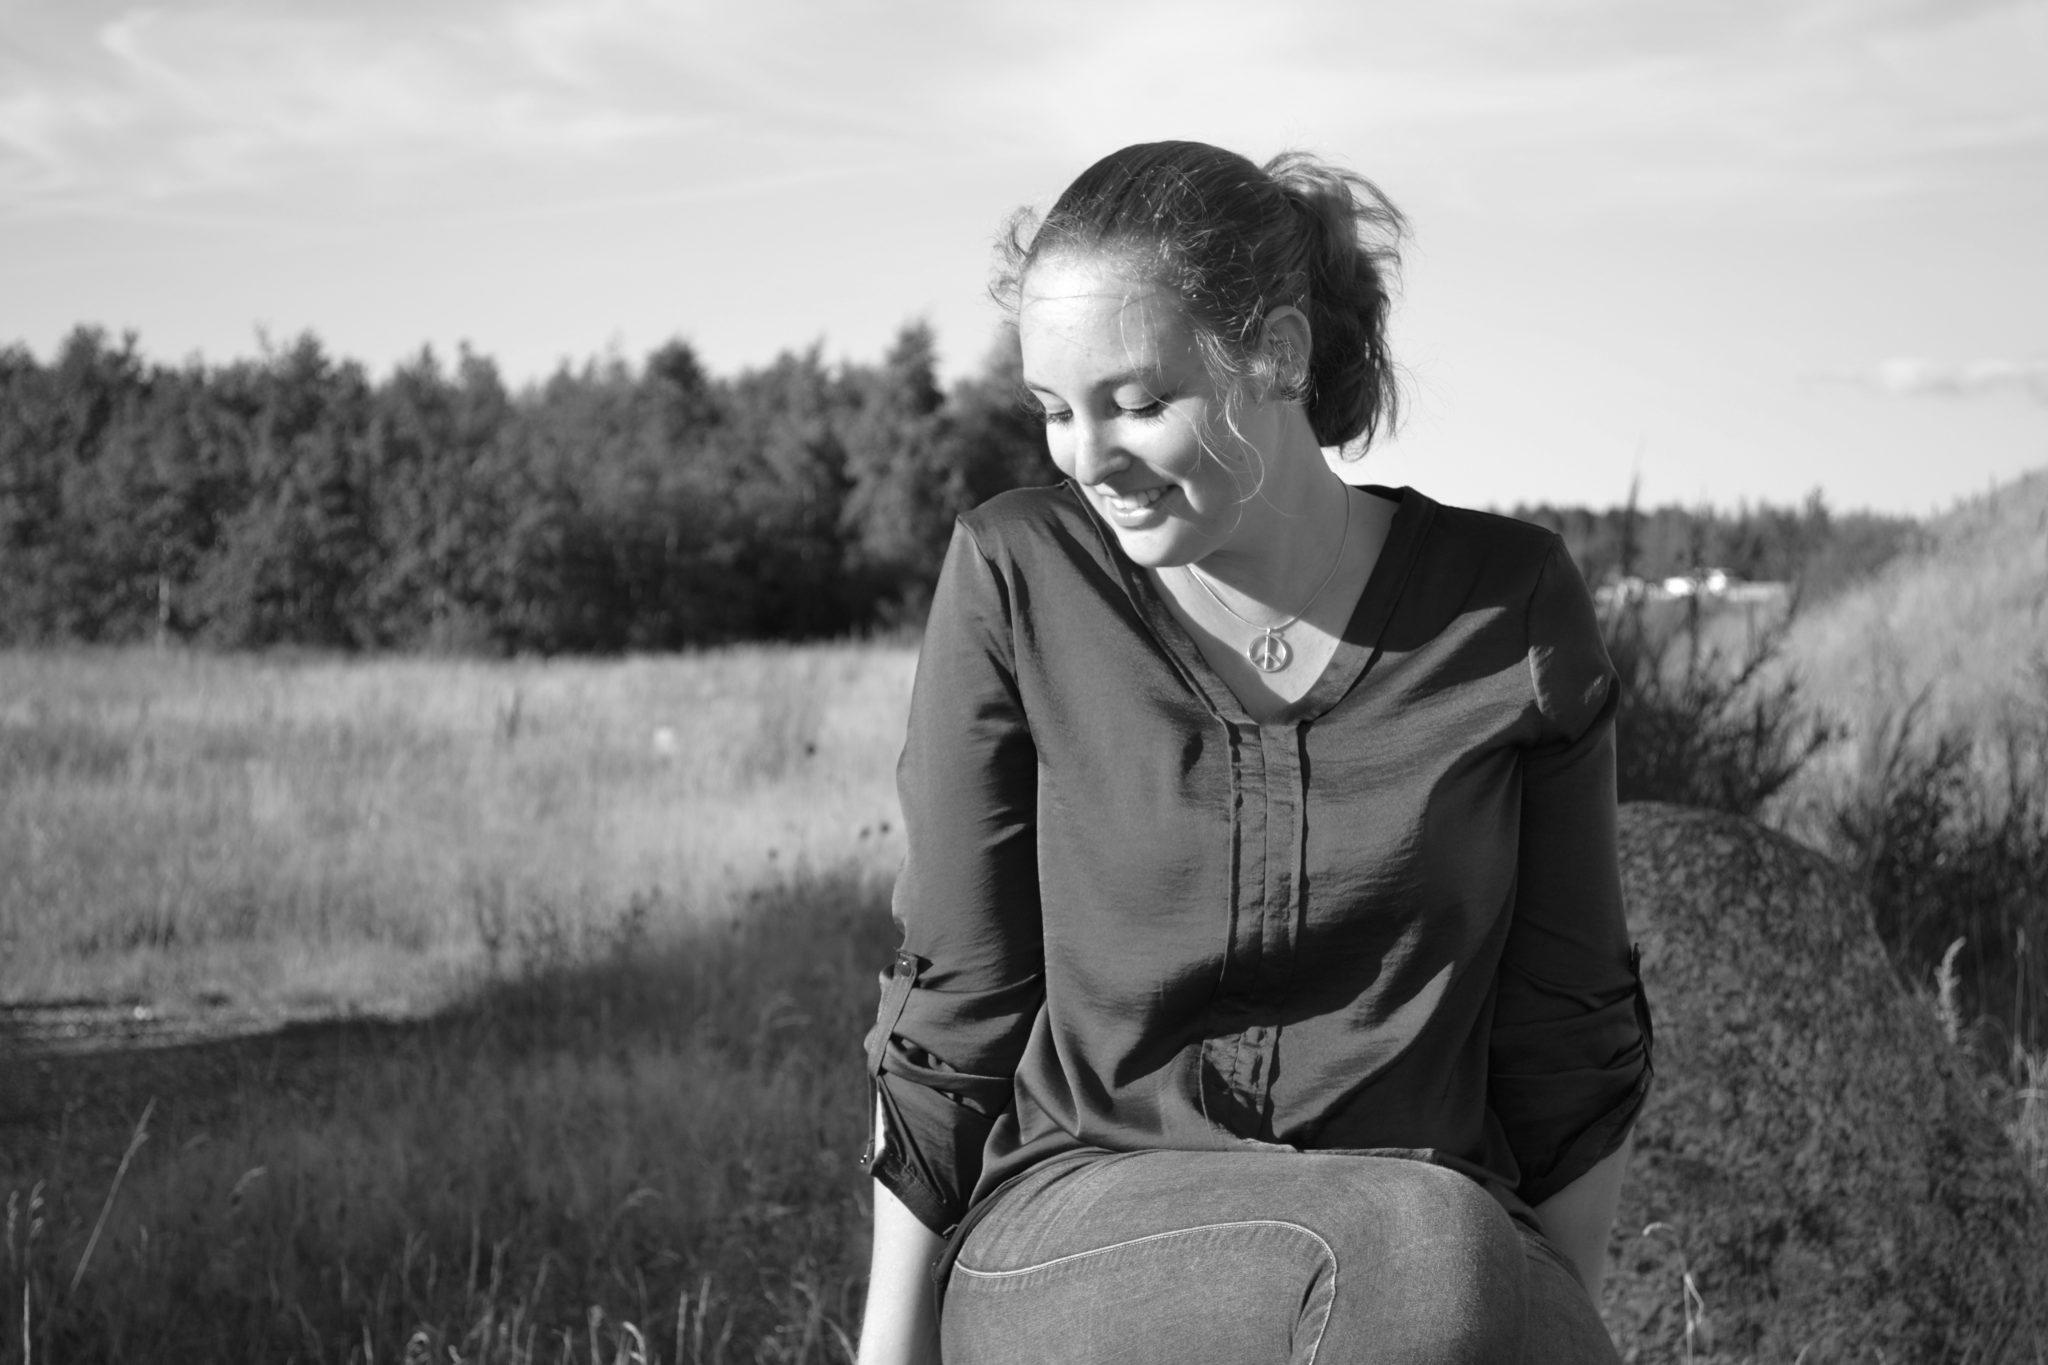 5 things that rocked my world in September - DSC 0047 Kopie